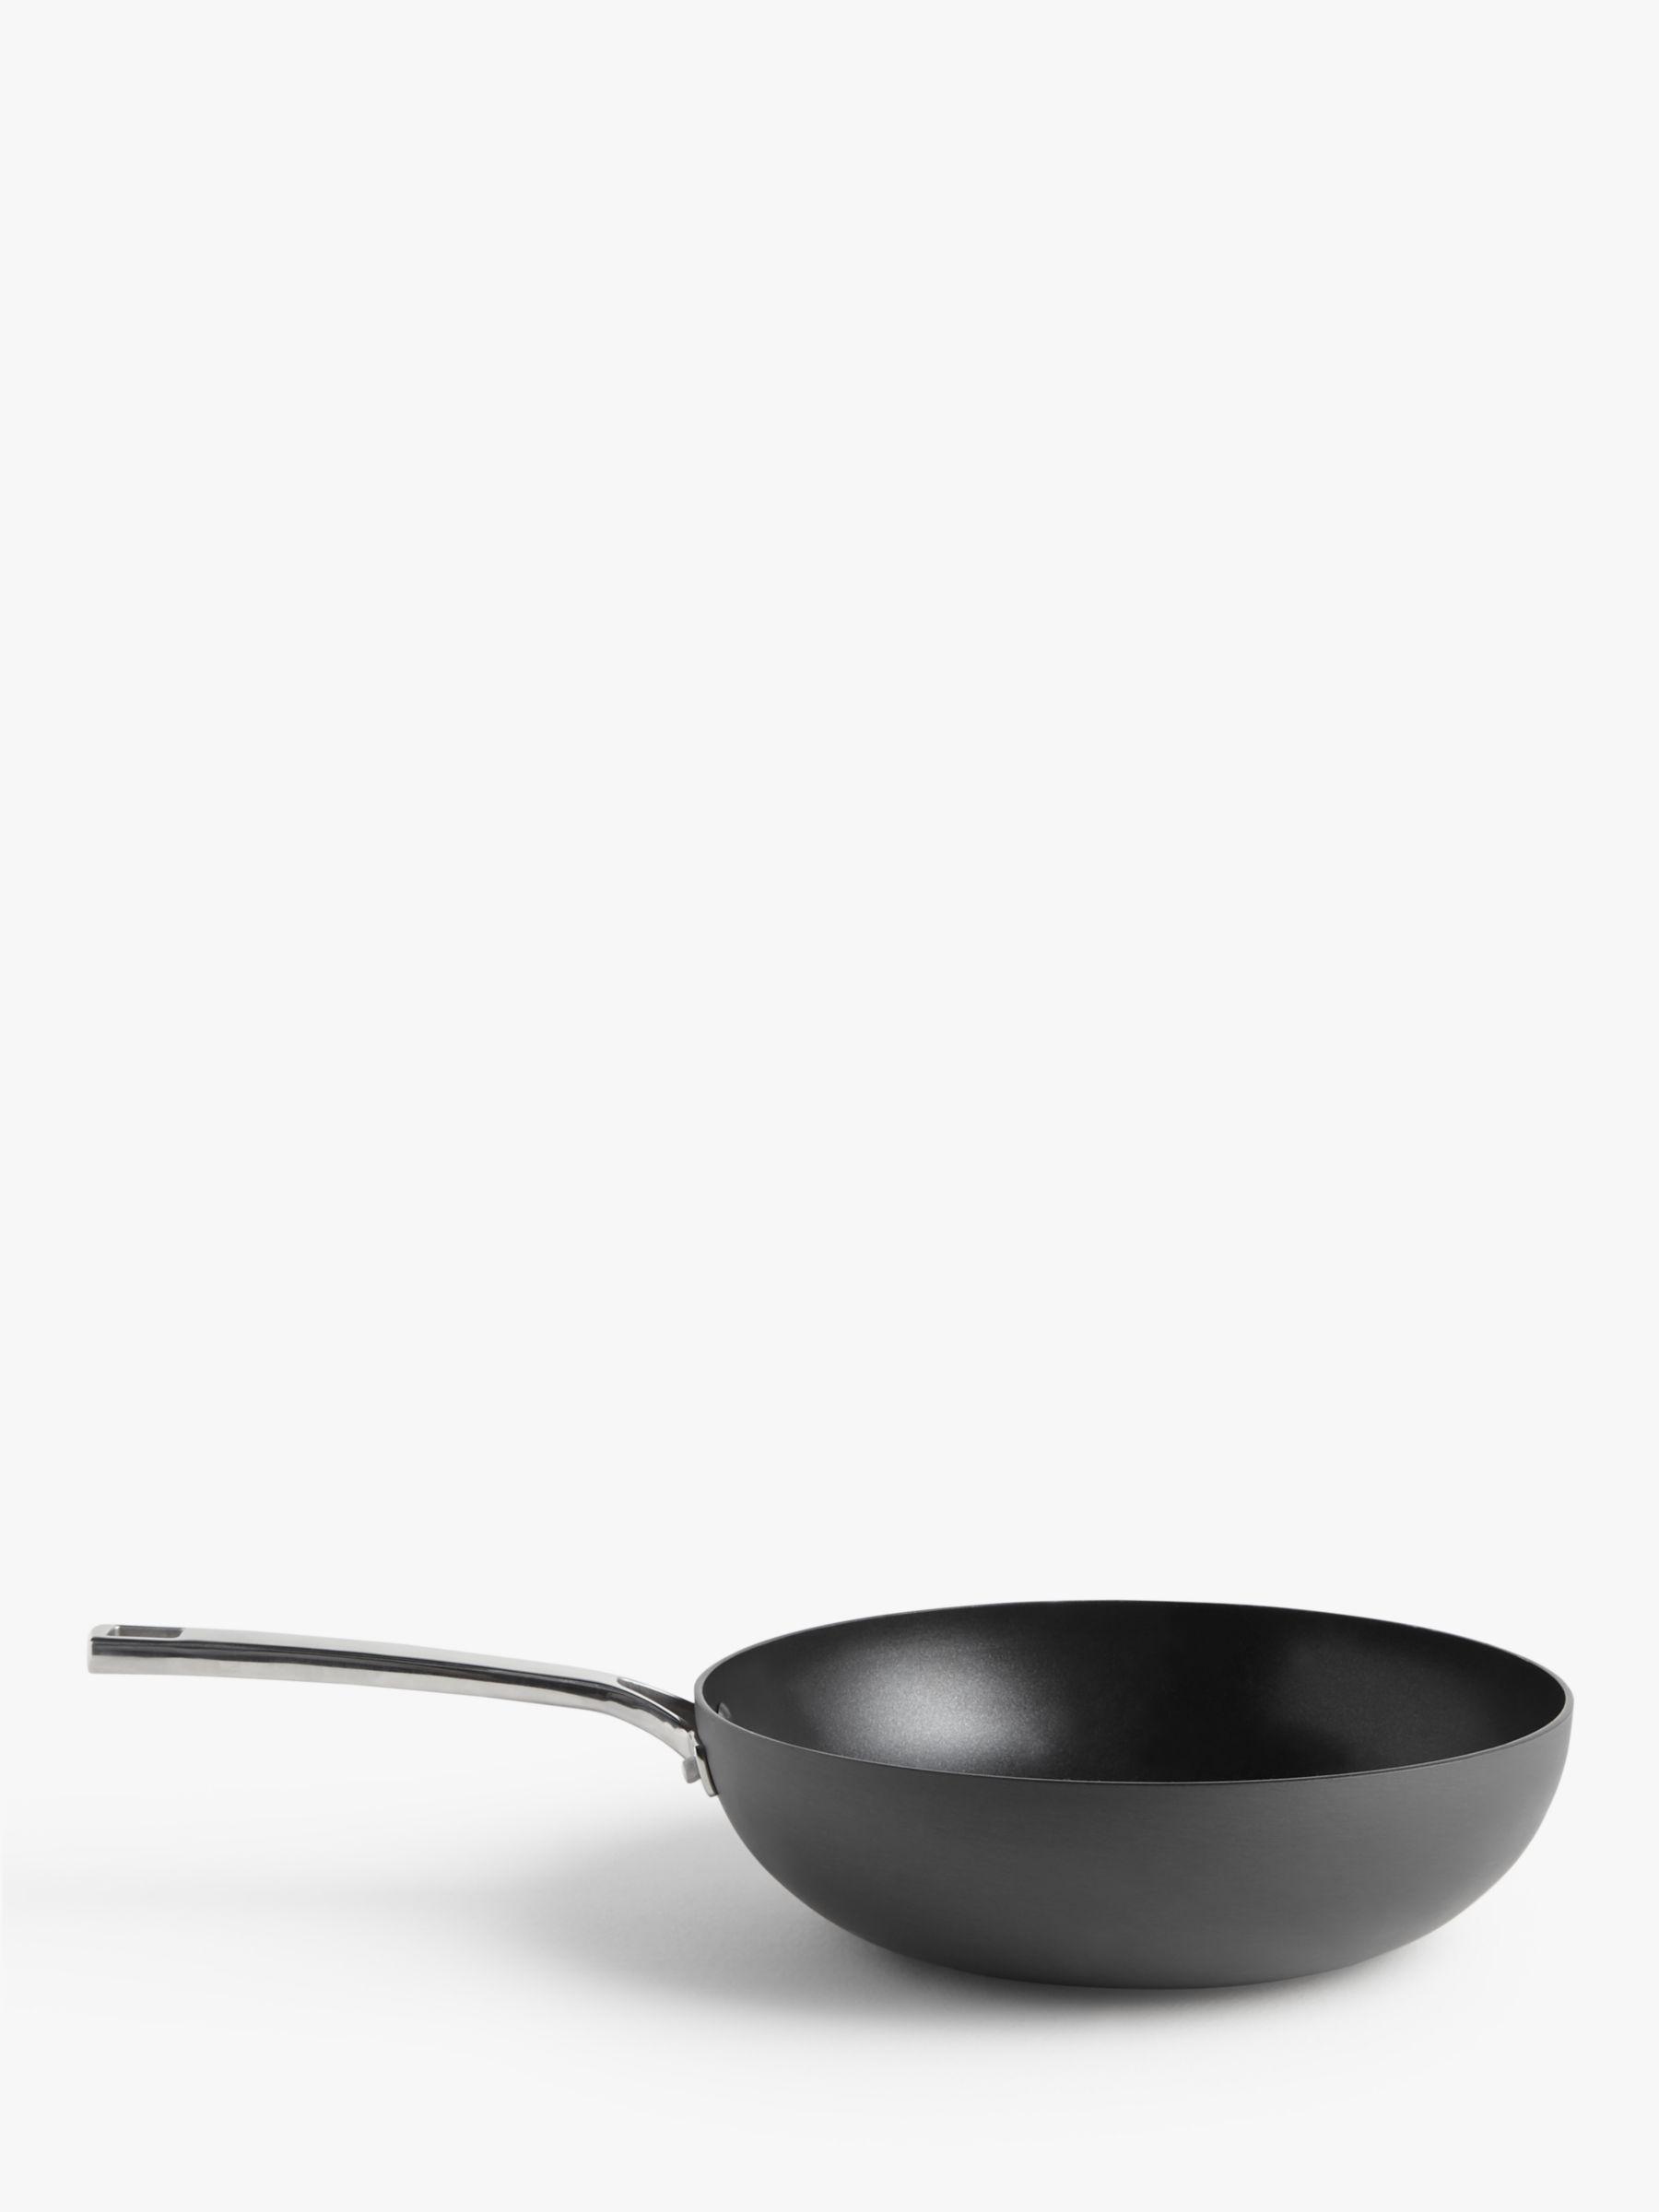 John Lewis & Partners Hard Anodised Aluminium Non-Stick Wok, 28cm, Grey